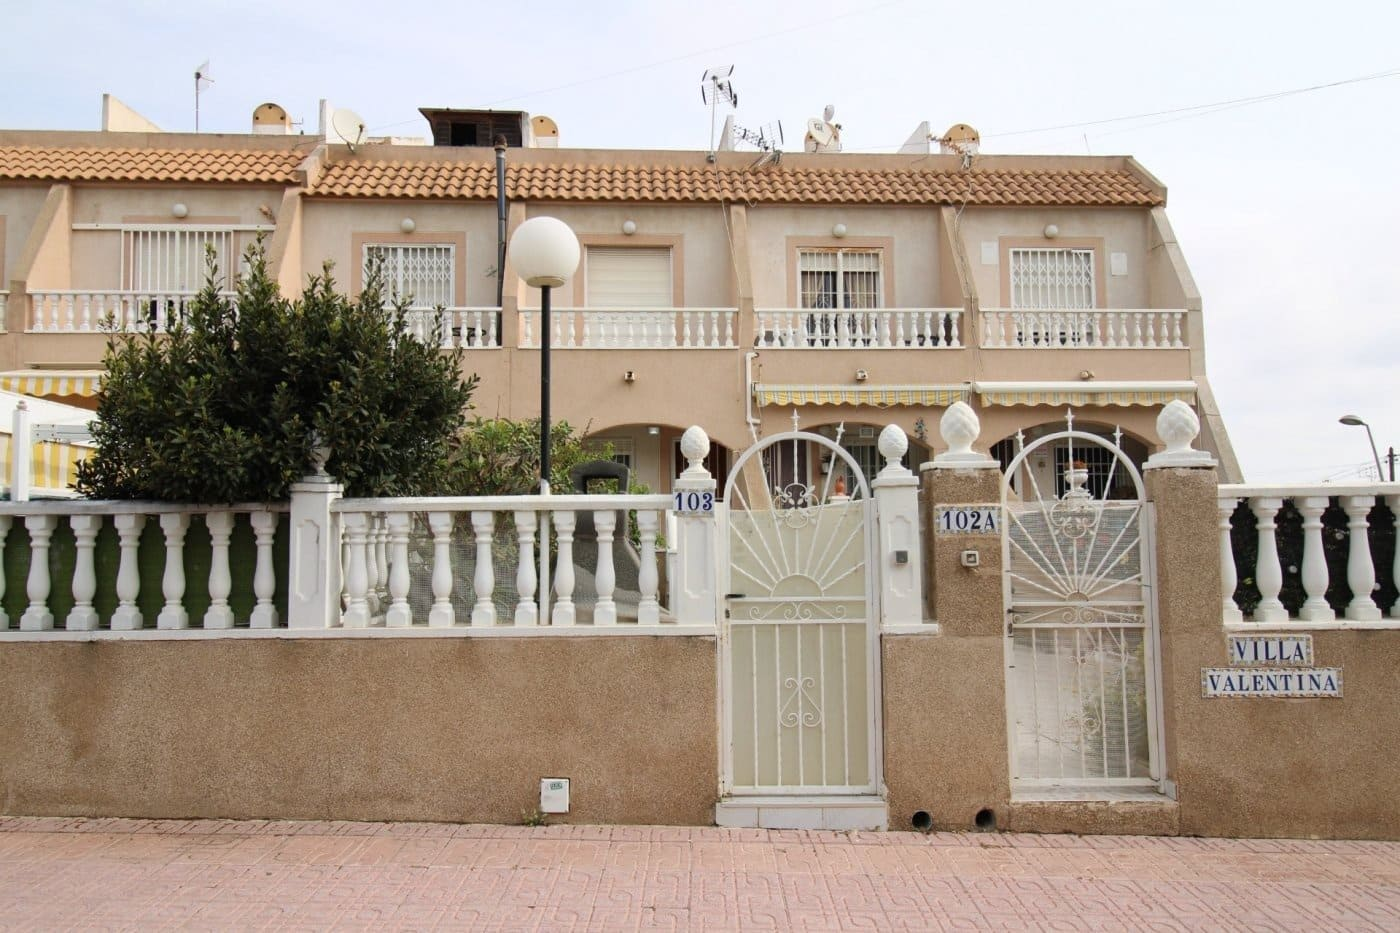 3 bedroom Apartment for sale in Los Balcones with pool garage - € 109,000 (Ref: 6157603)